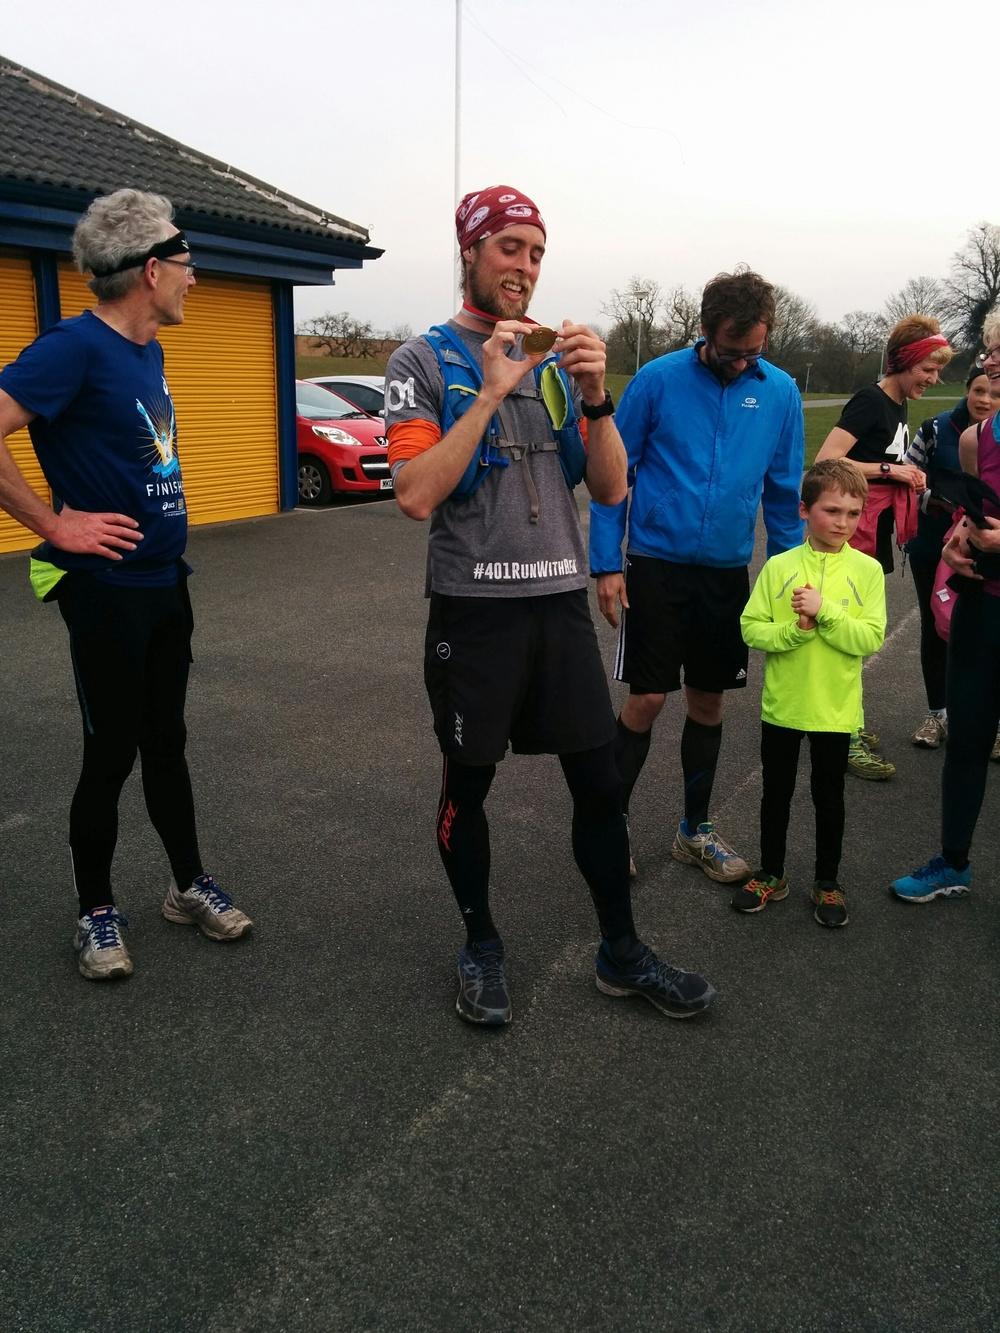 Ben accepting his post run medal